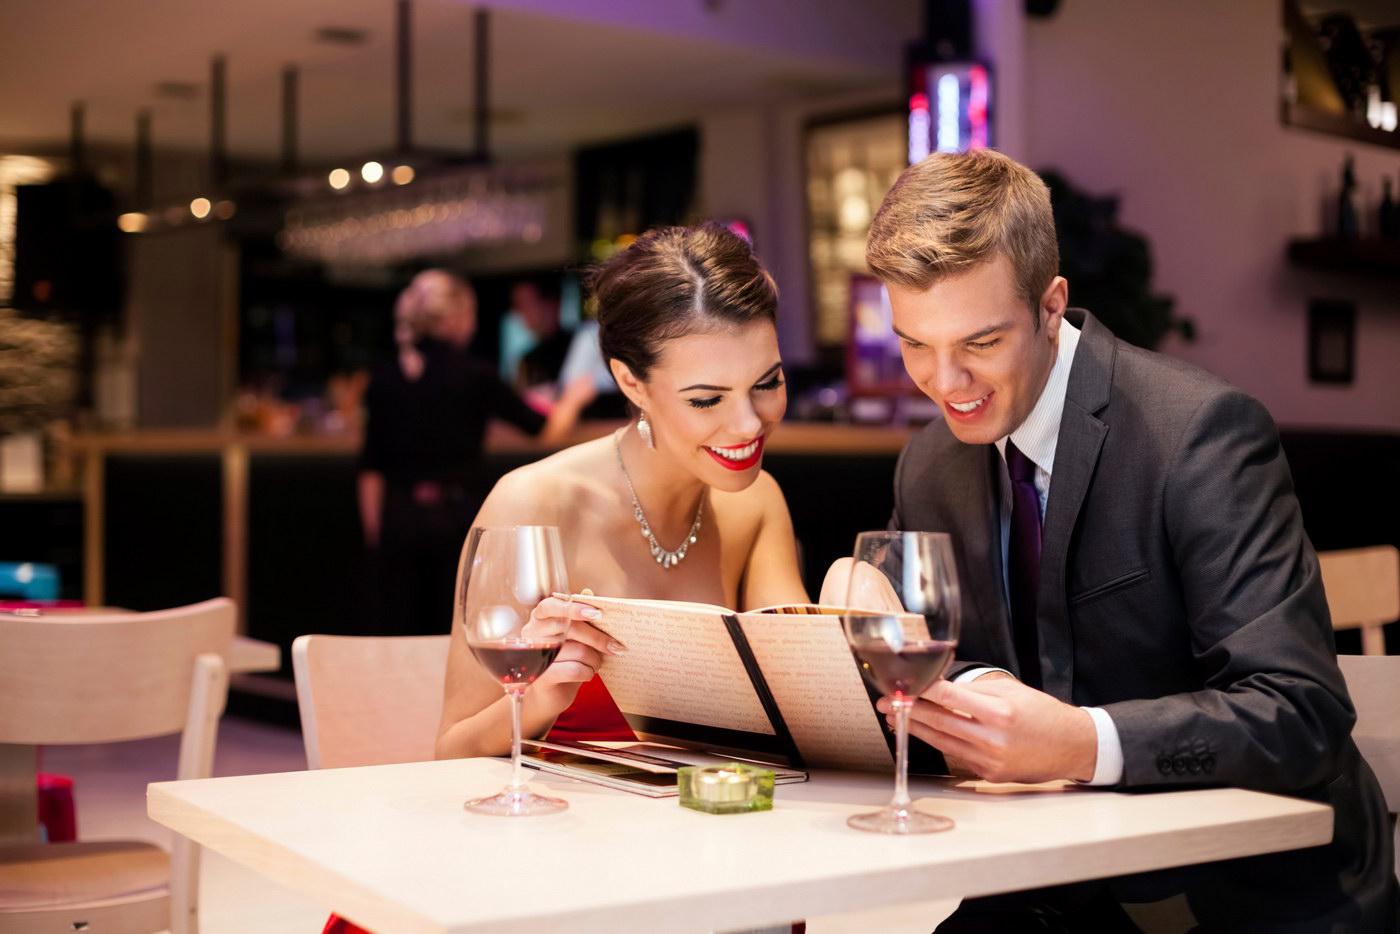 Cum sa alegi restaurantul pentru intalnire